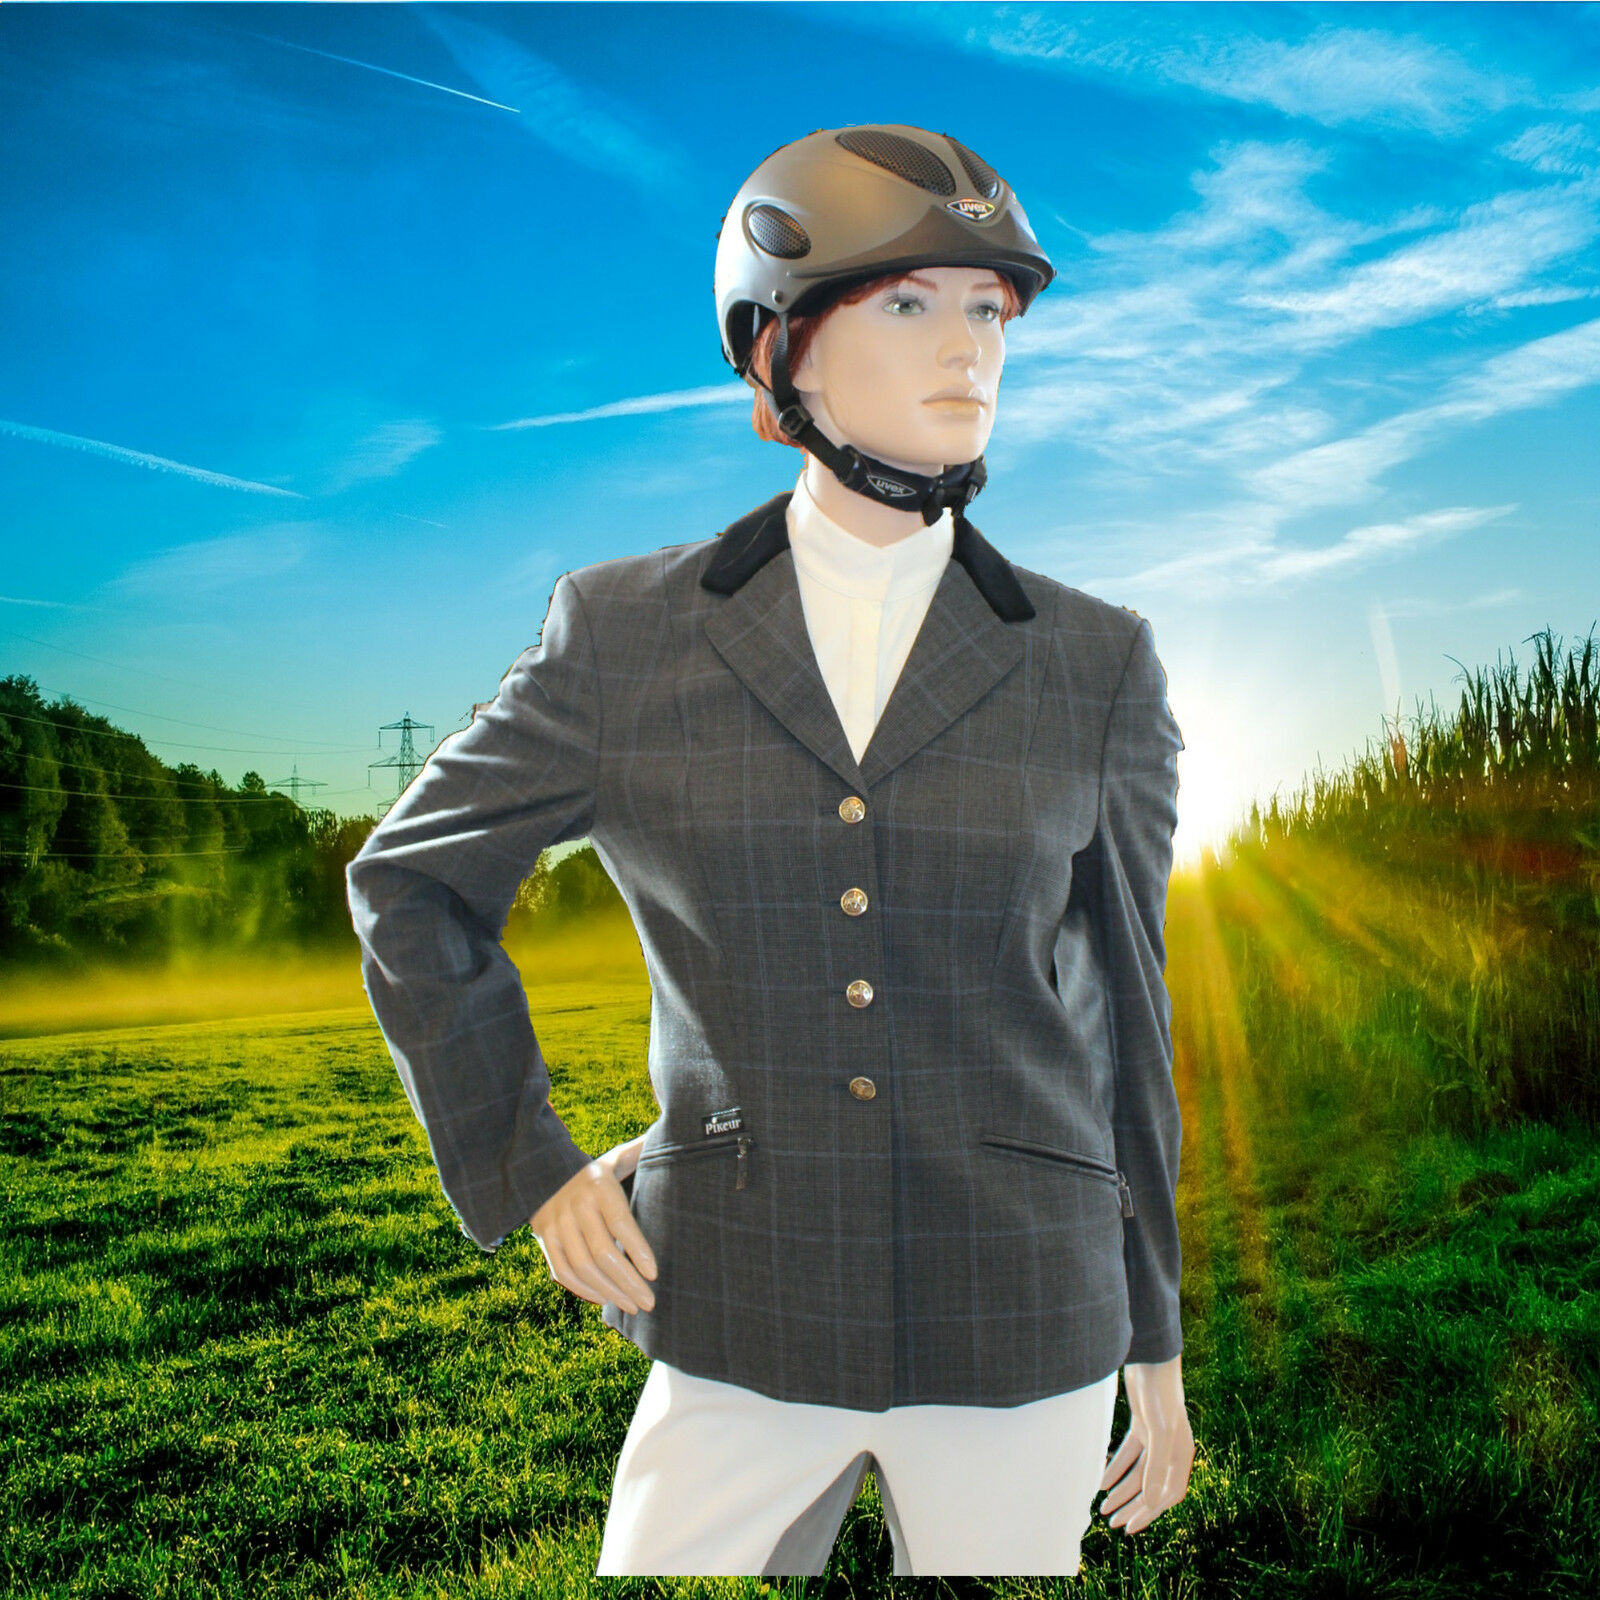 PIKEUR Turniersakko Skarlett, Turnierjacke, Karodesign , grau-blau, Größe 42